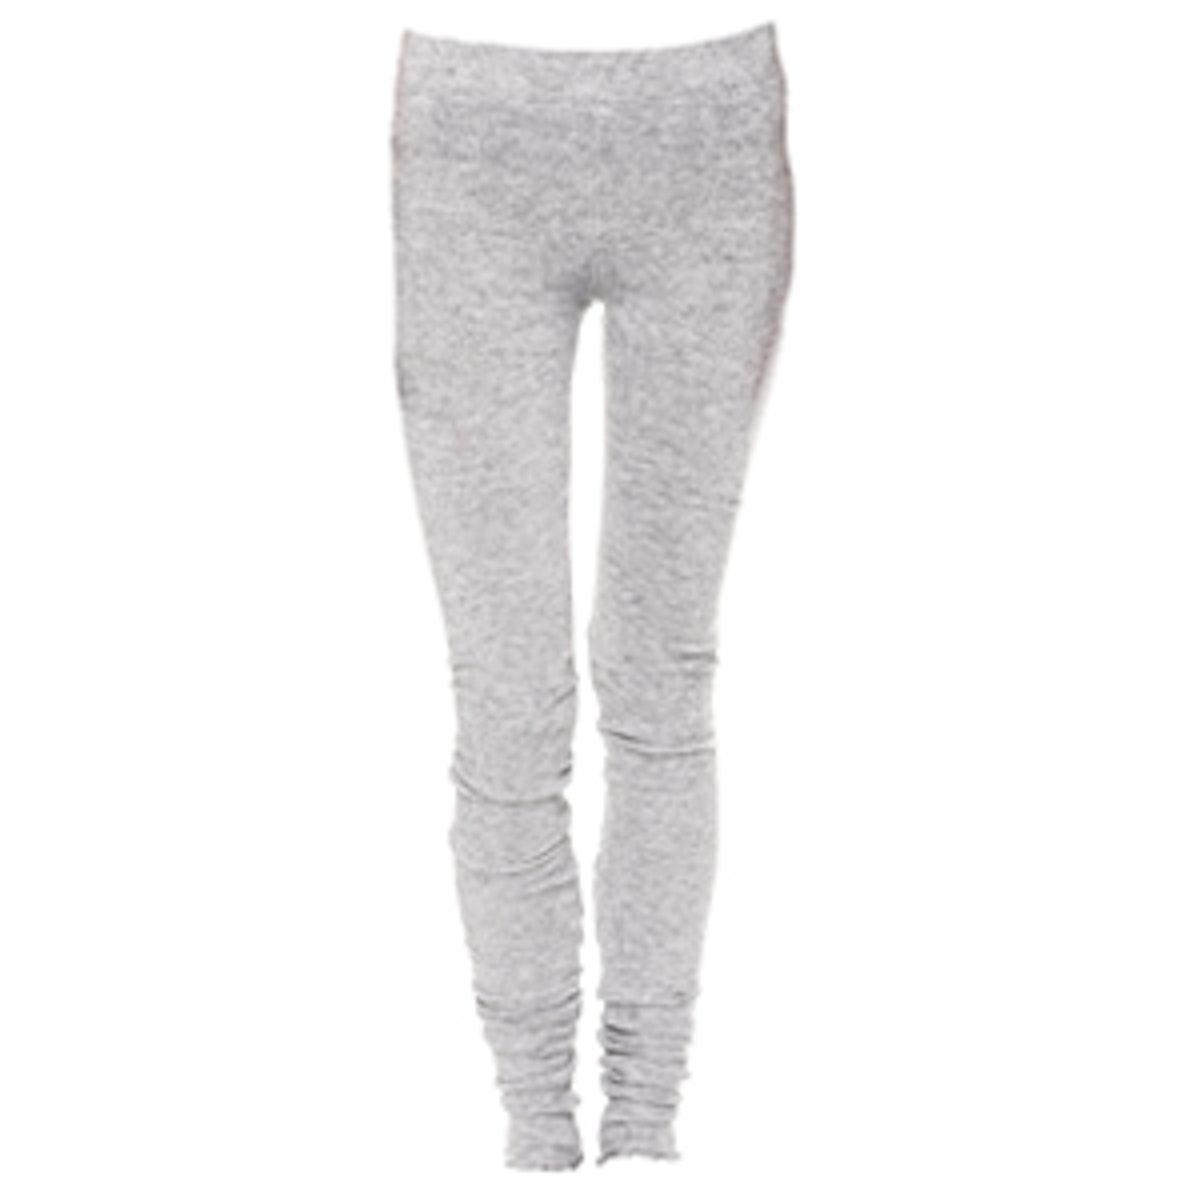 Heathered Knit Leggings